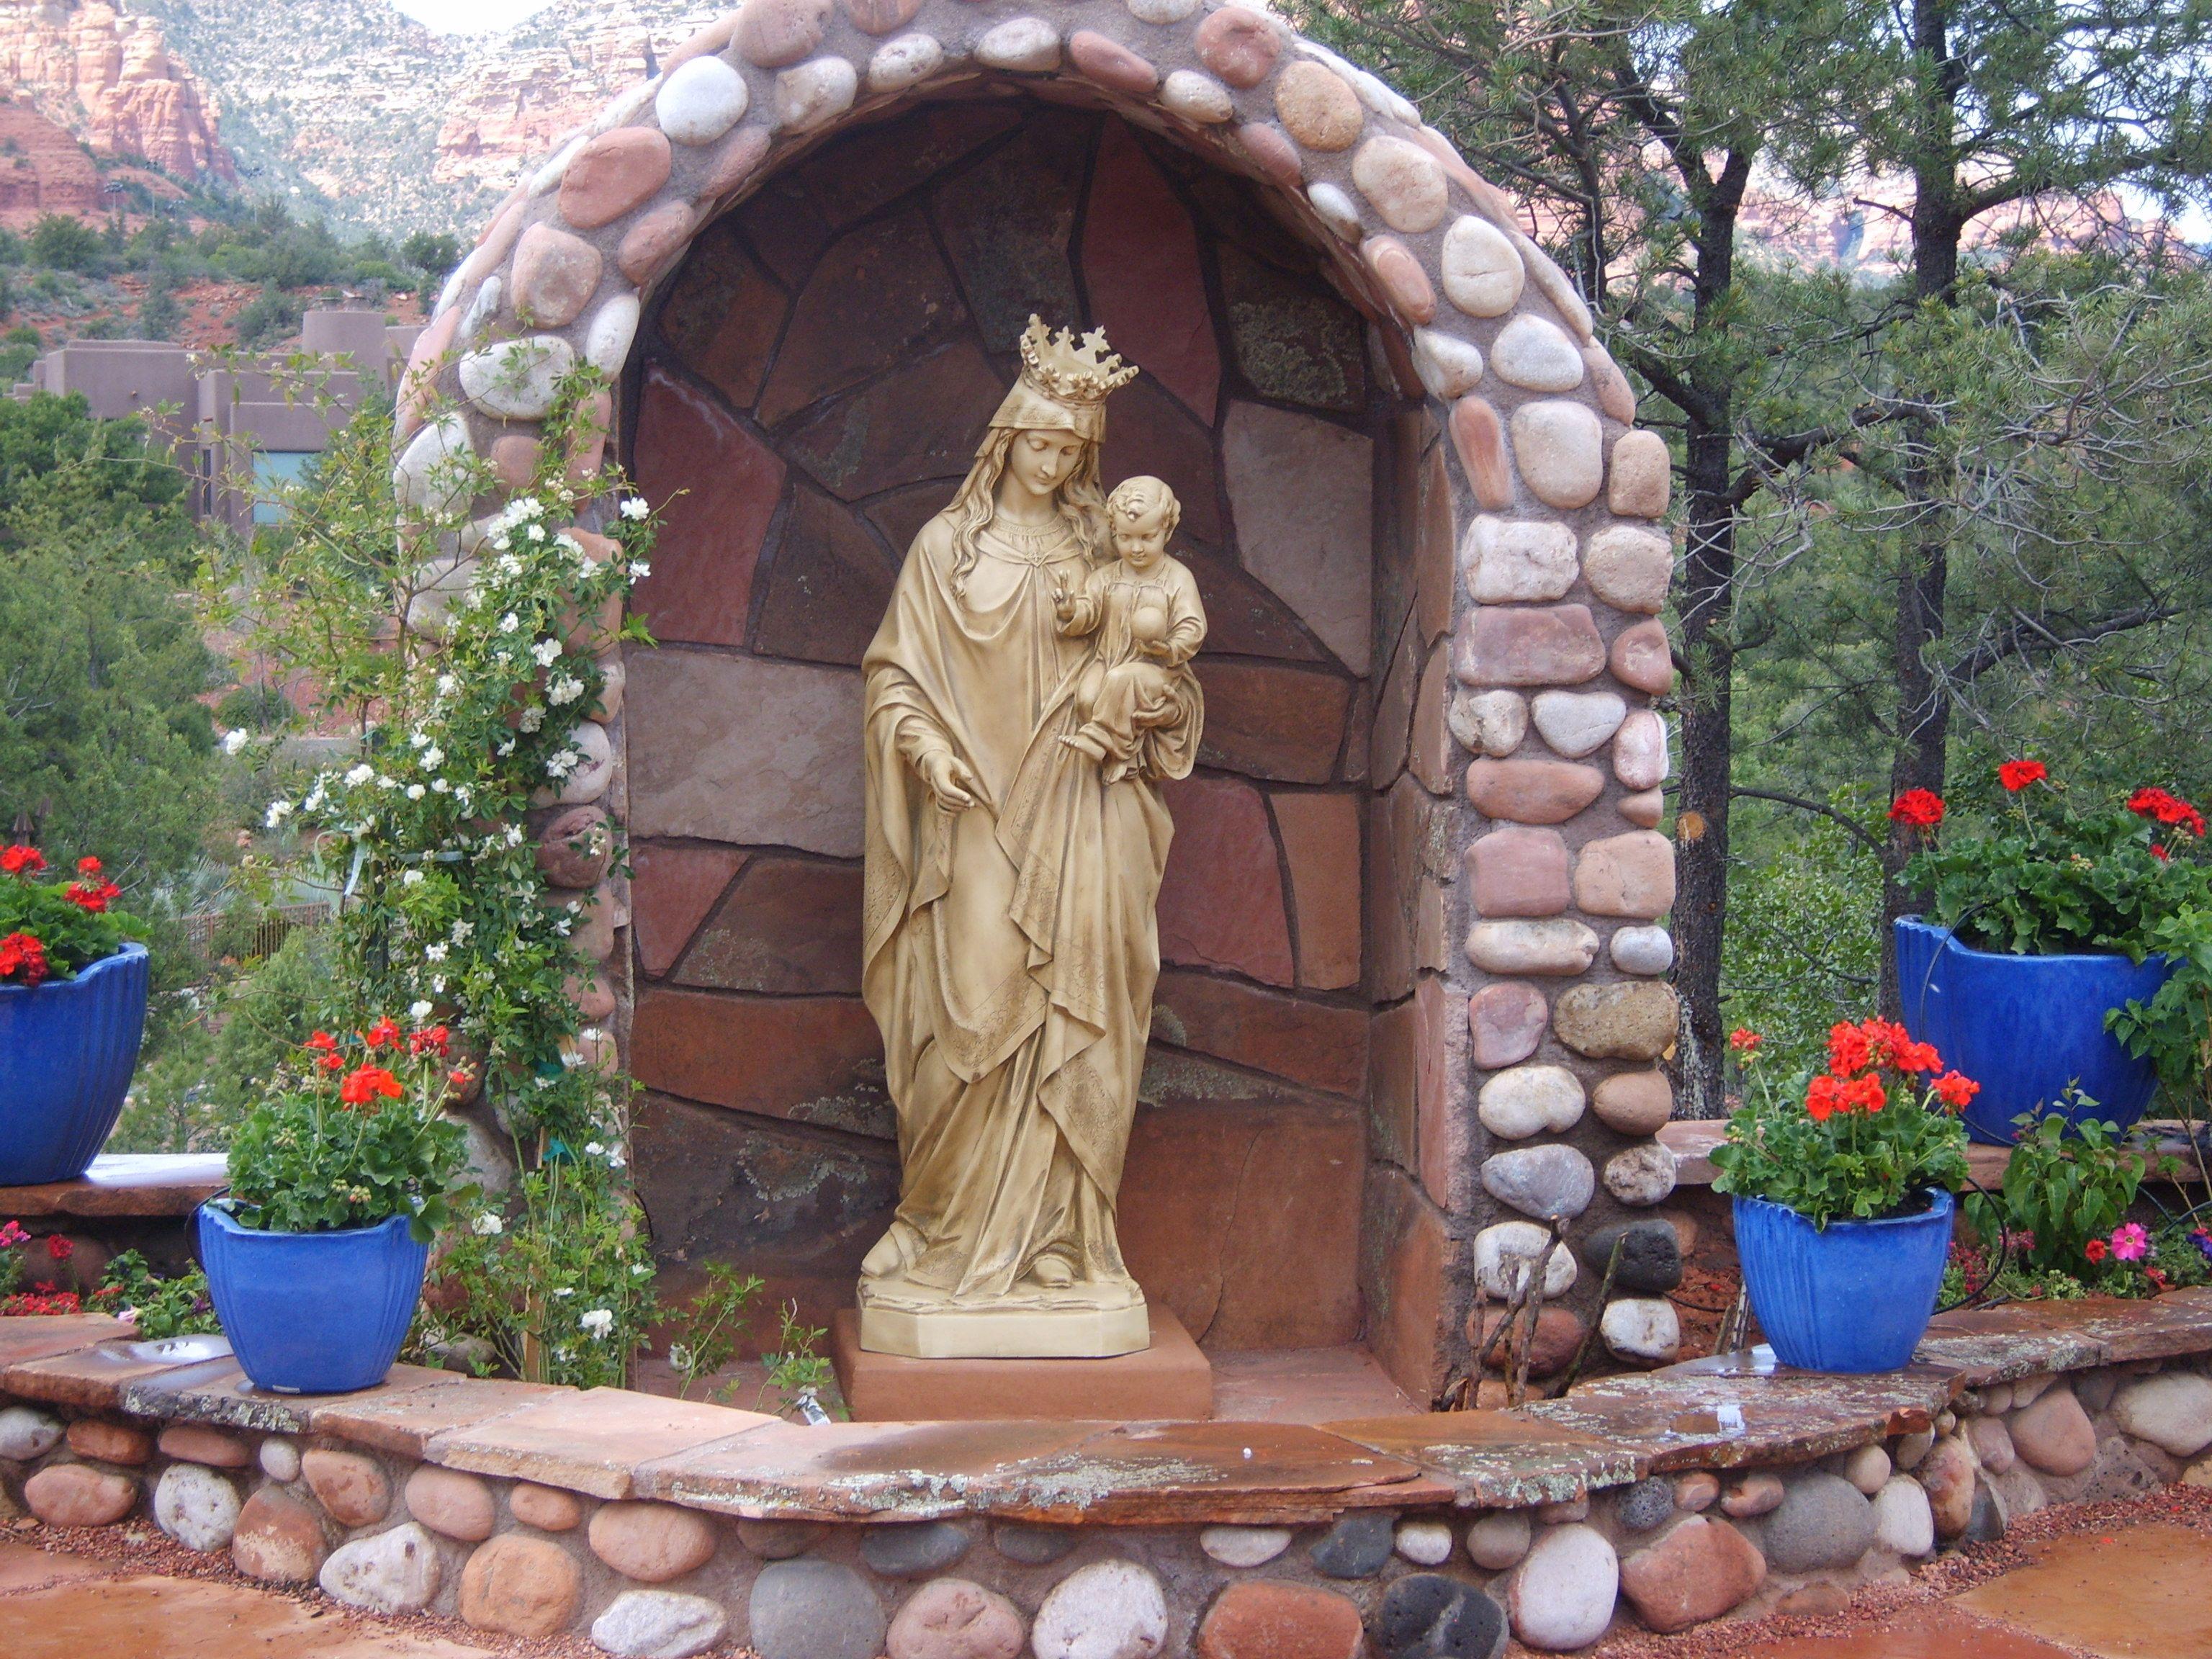 St John Vianney Sedona AZ Holy Mother Mary Garden Pinterest